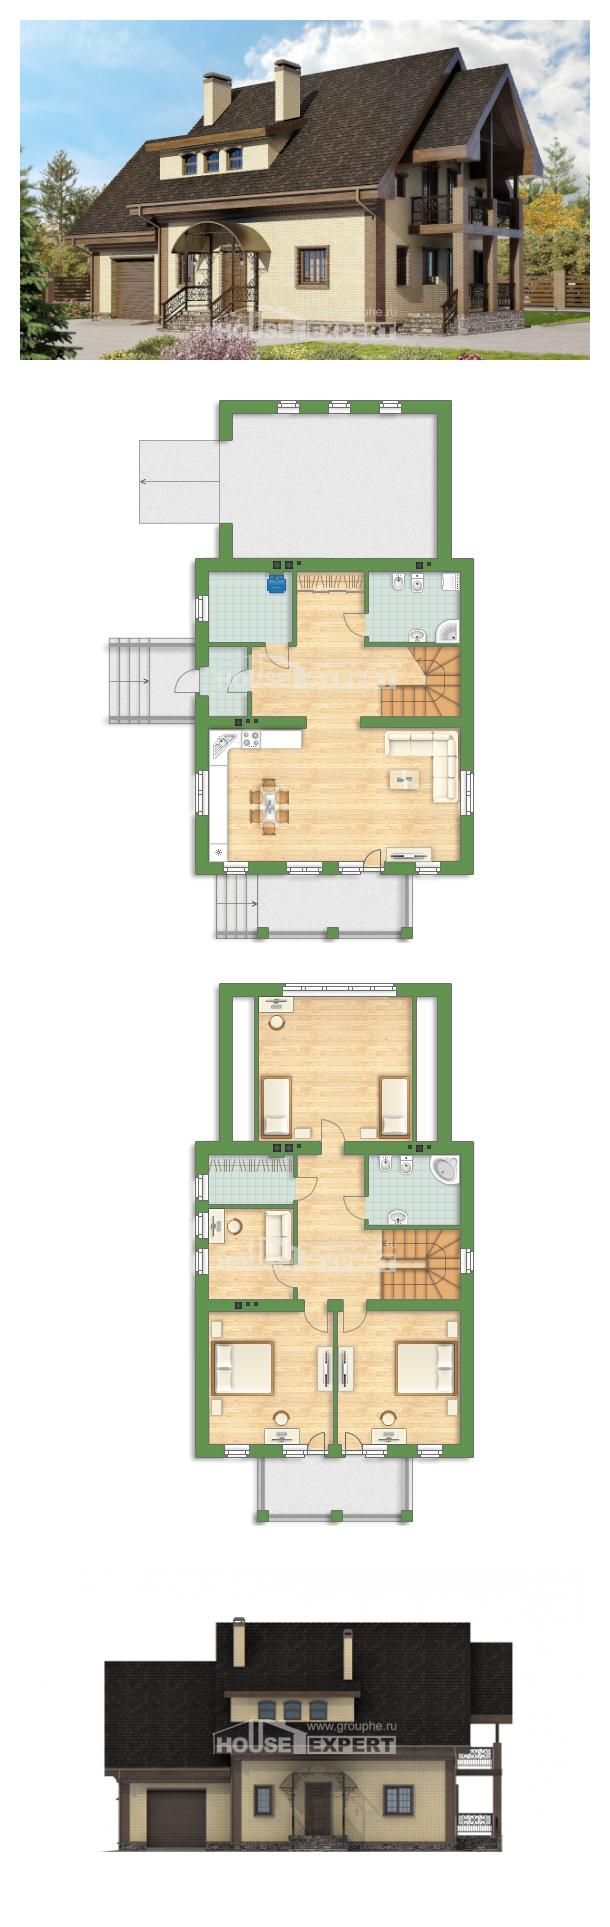 Projekt domu 185-003-L   House Expert